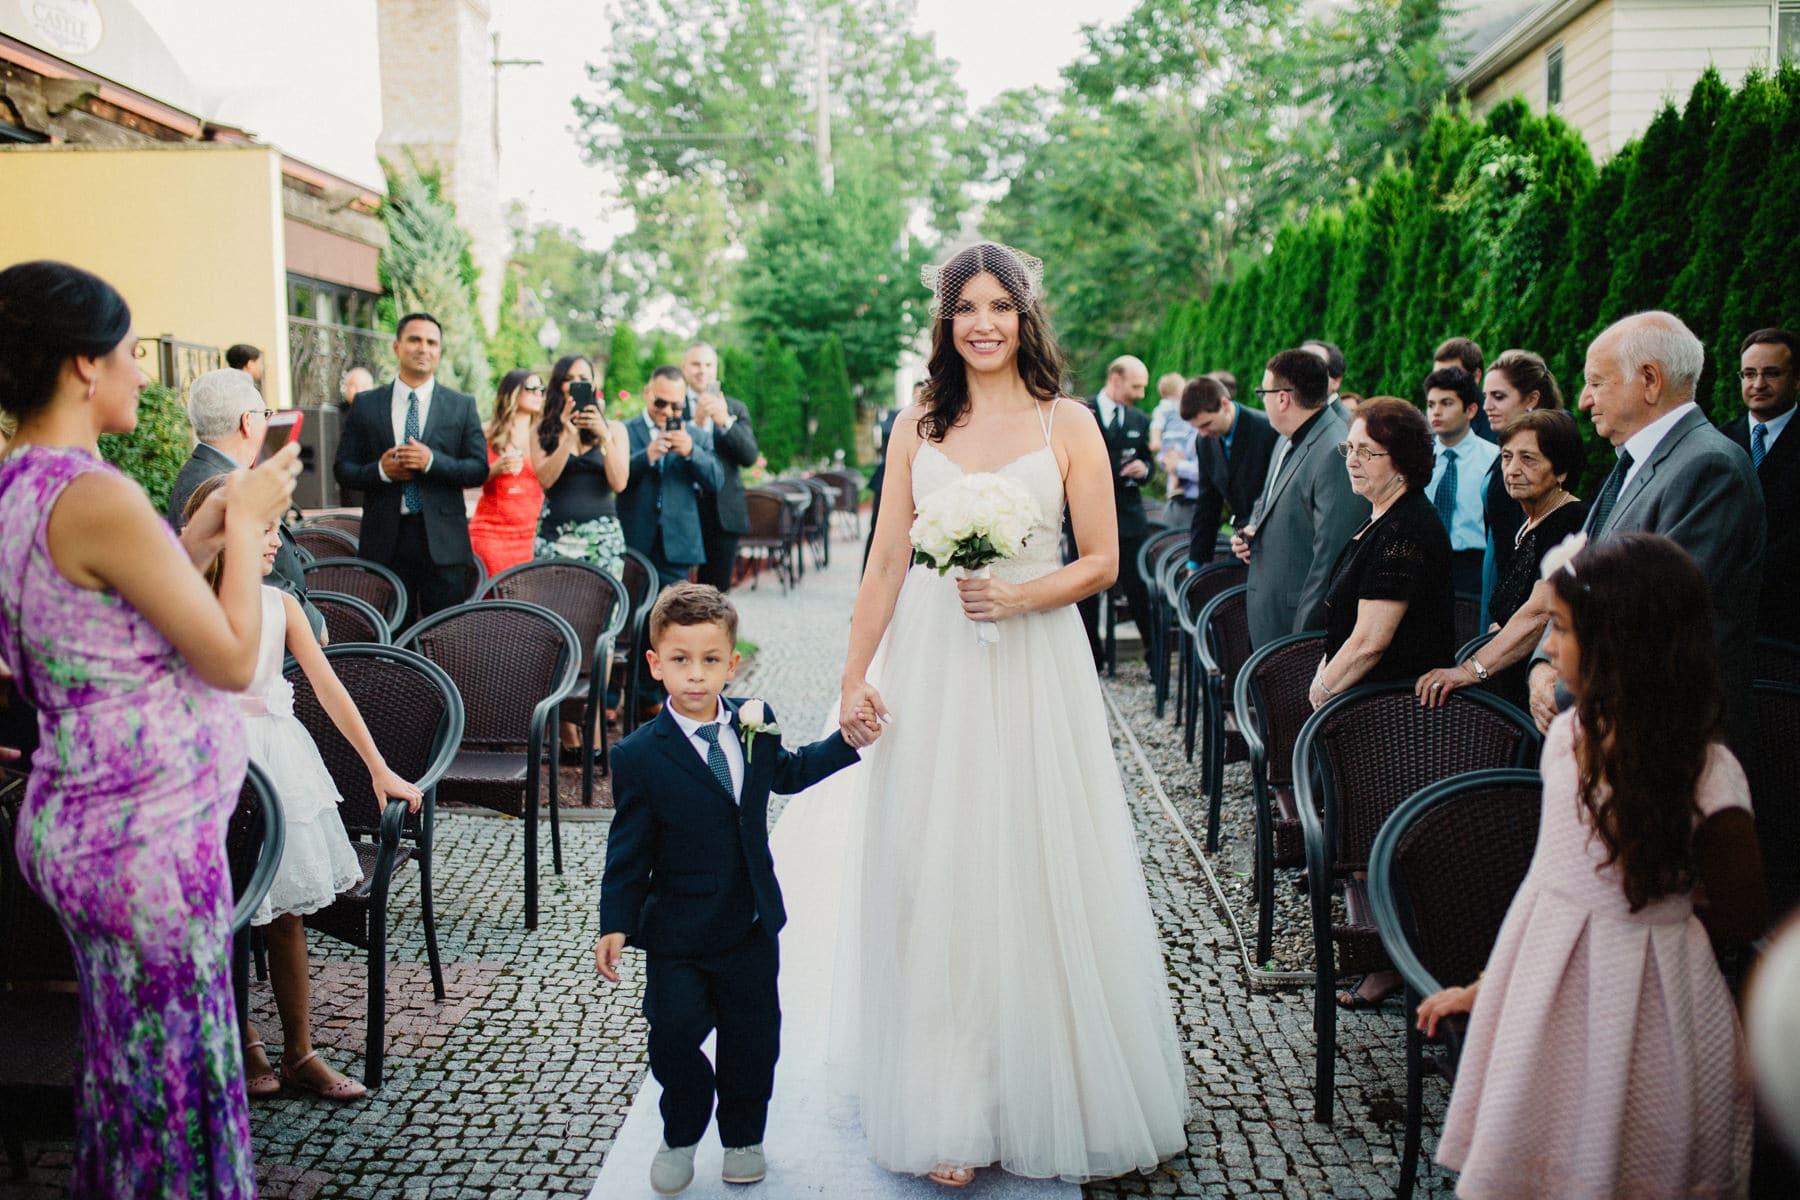 fotografo de casamento brasileiro nova jersey